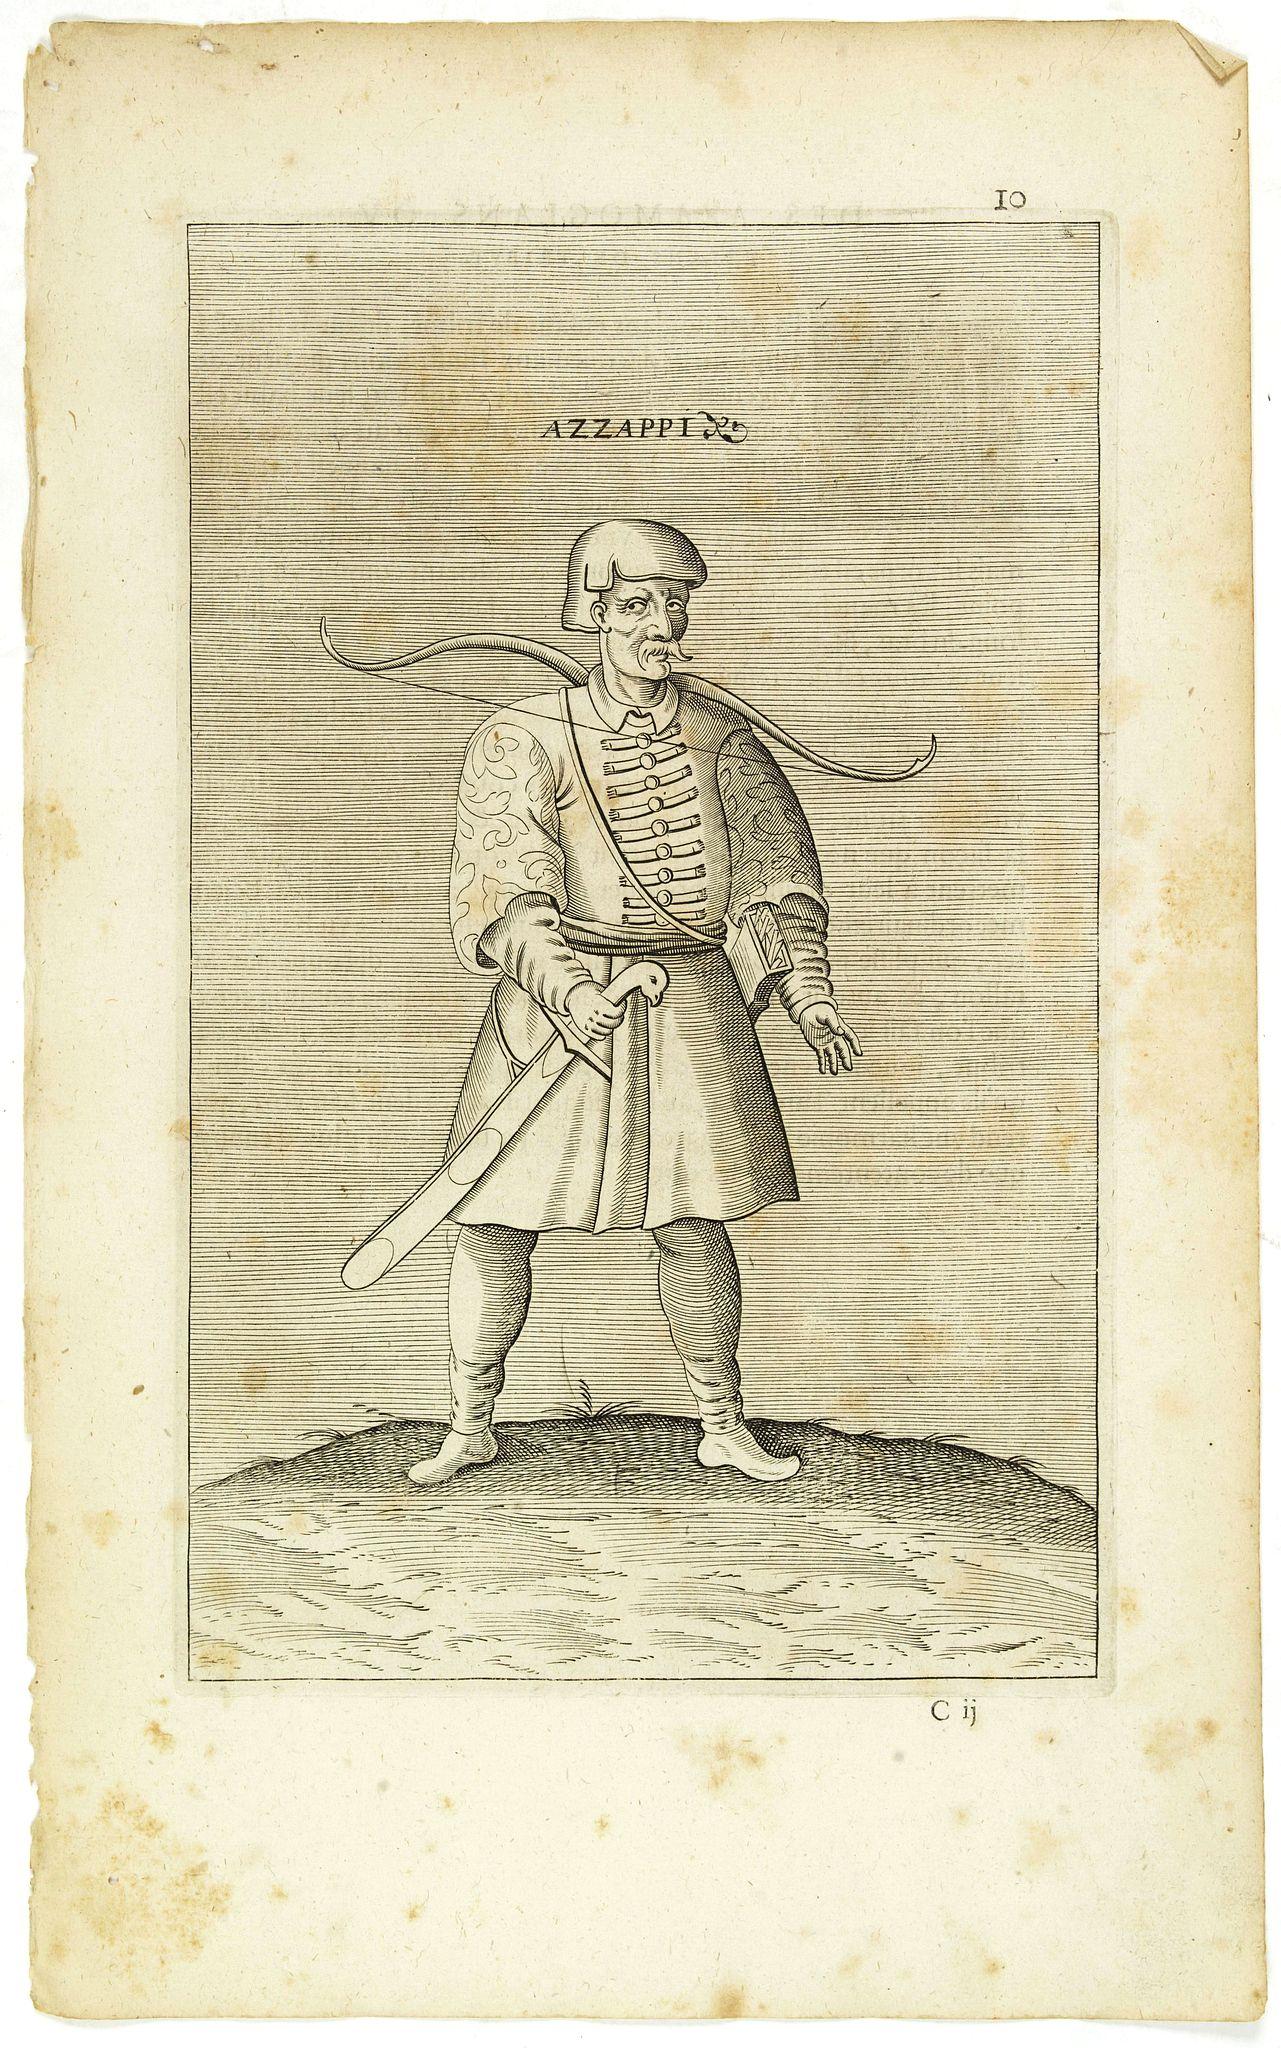 NICOLAS DE NICOLAY, Thomas Artus (sieur d'Embry). -  Azzappi. (10)